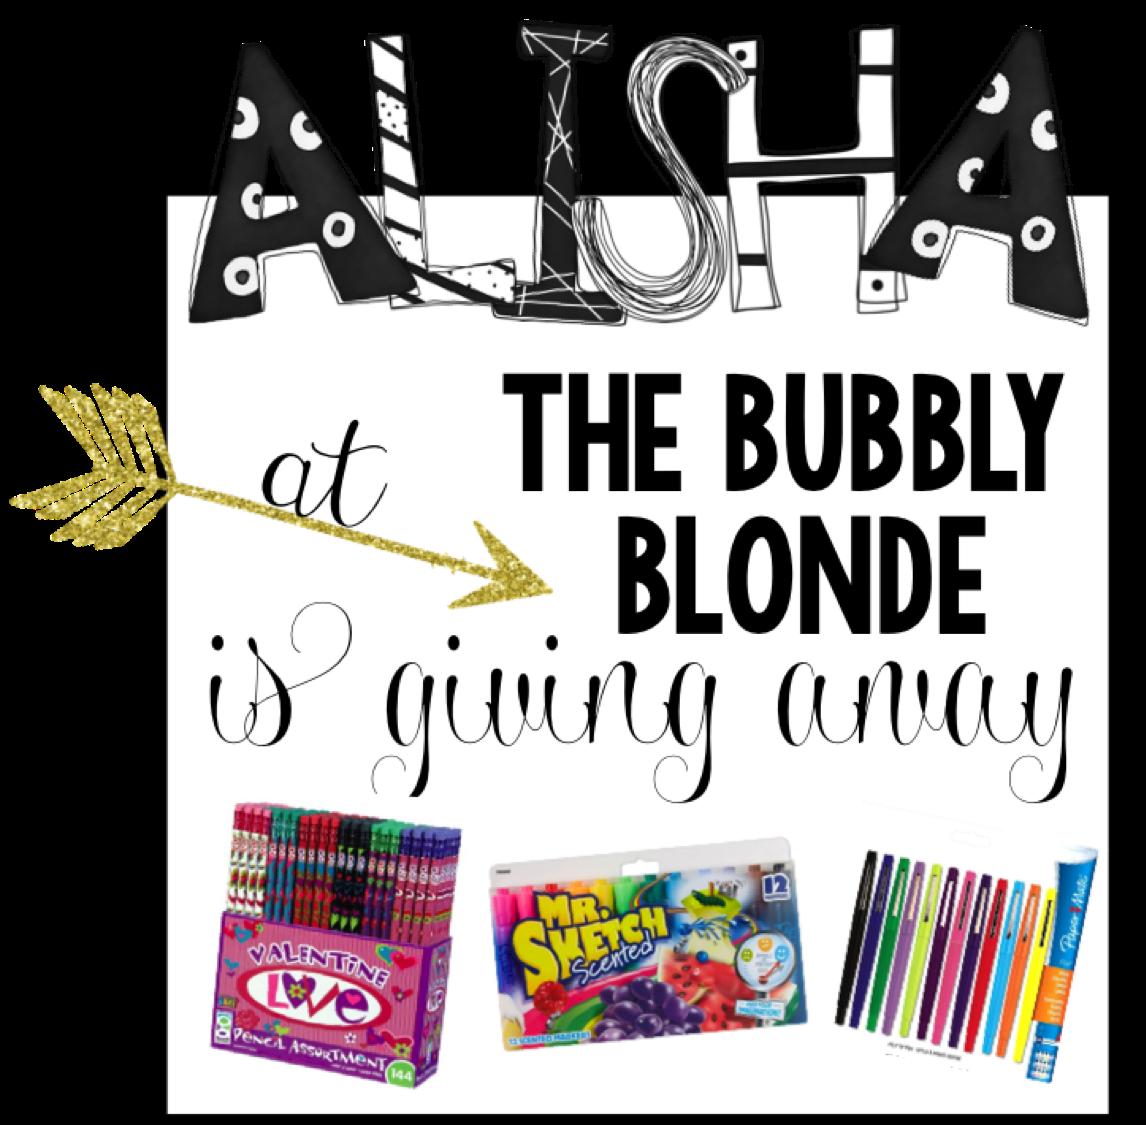 http://thebubblyblondeteacher.blogspot.com/